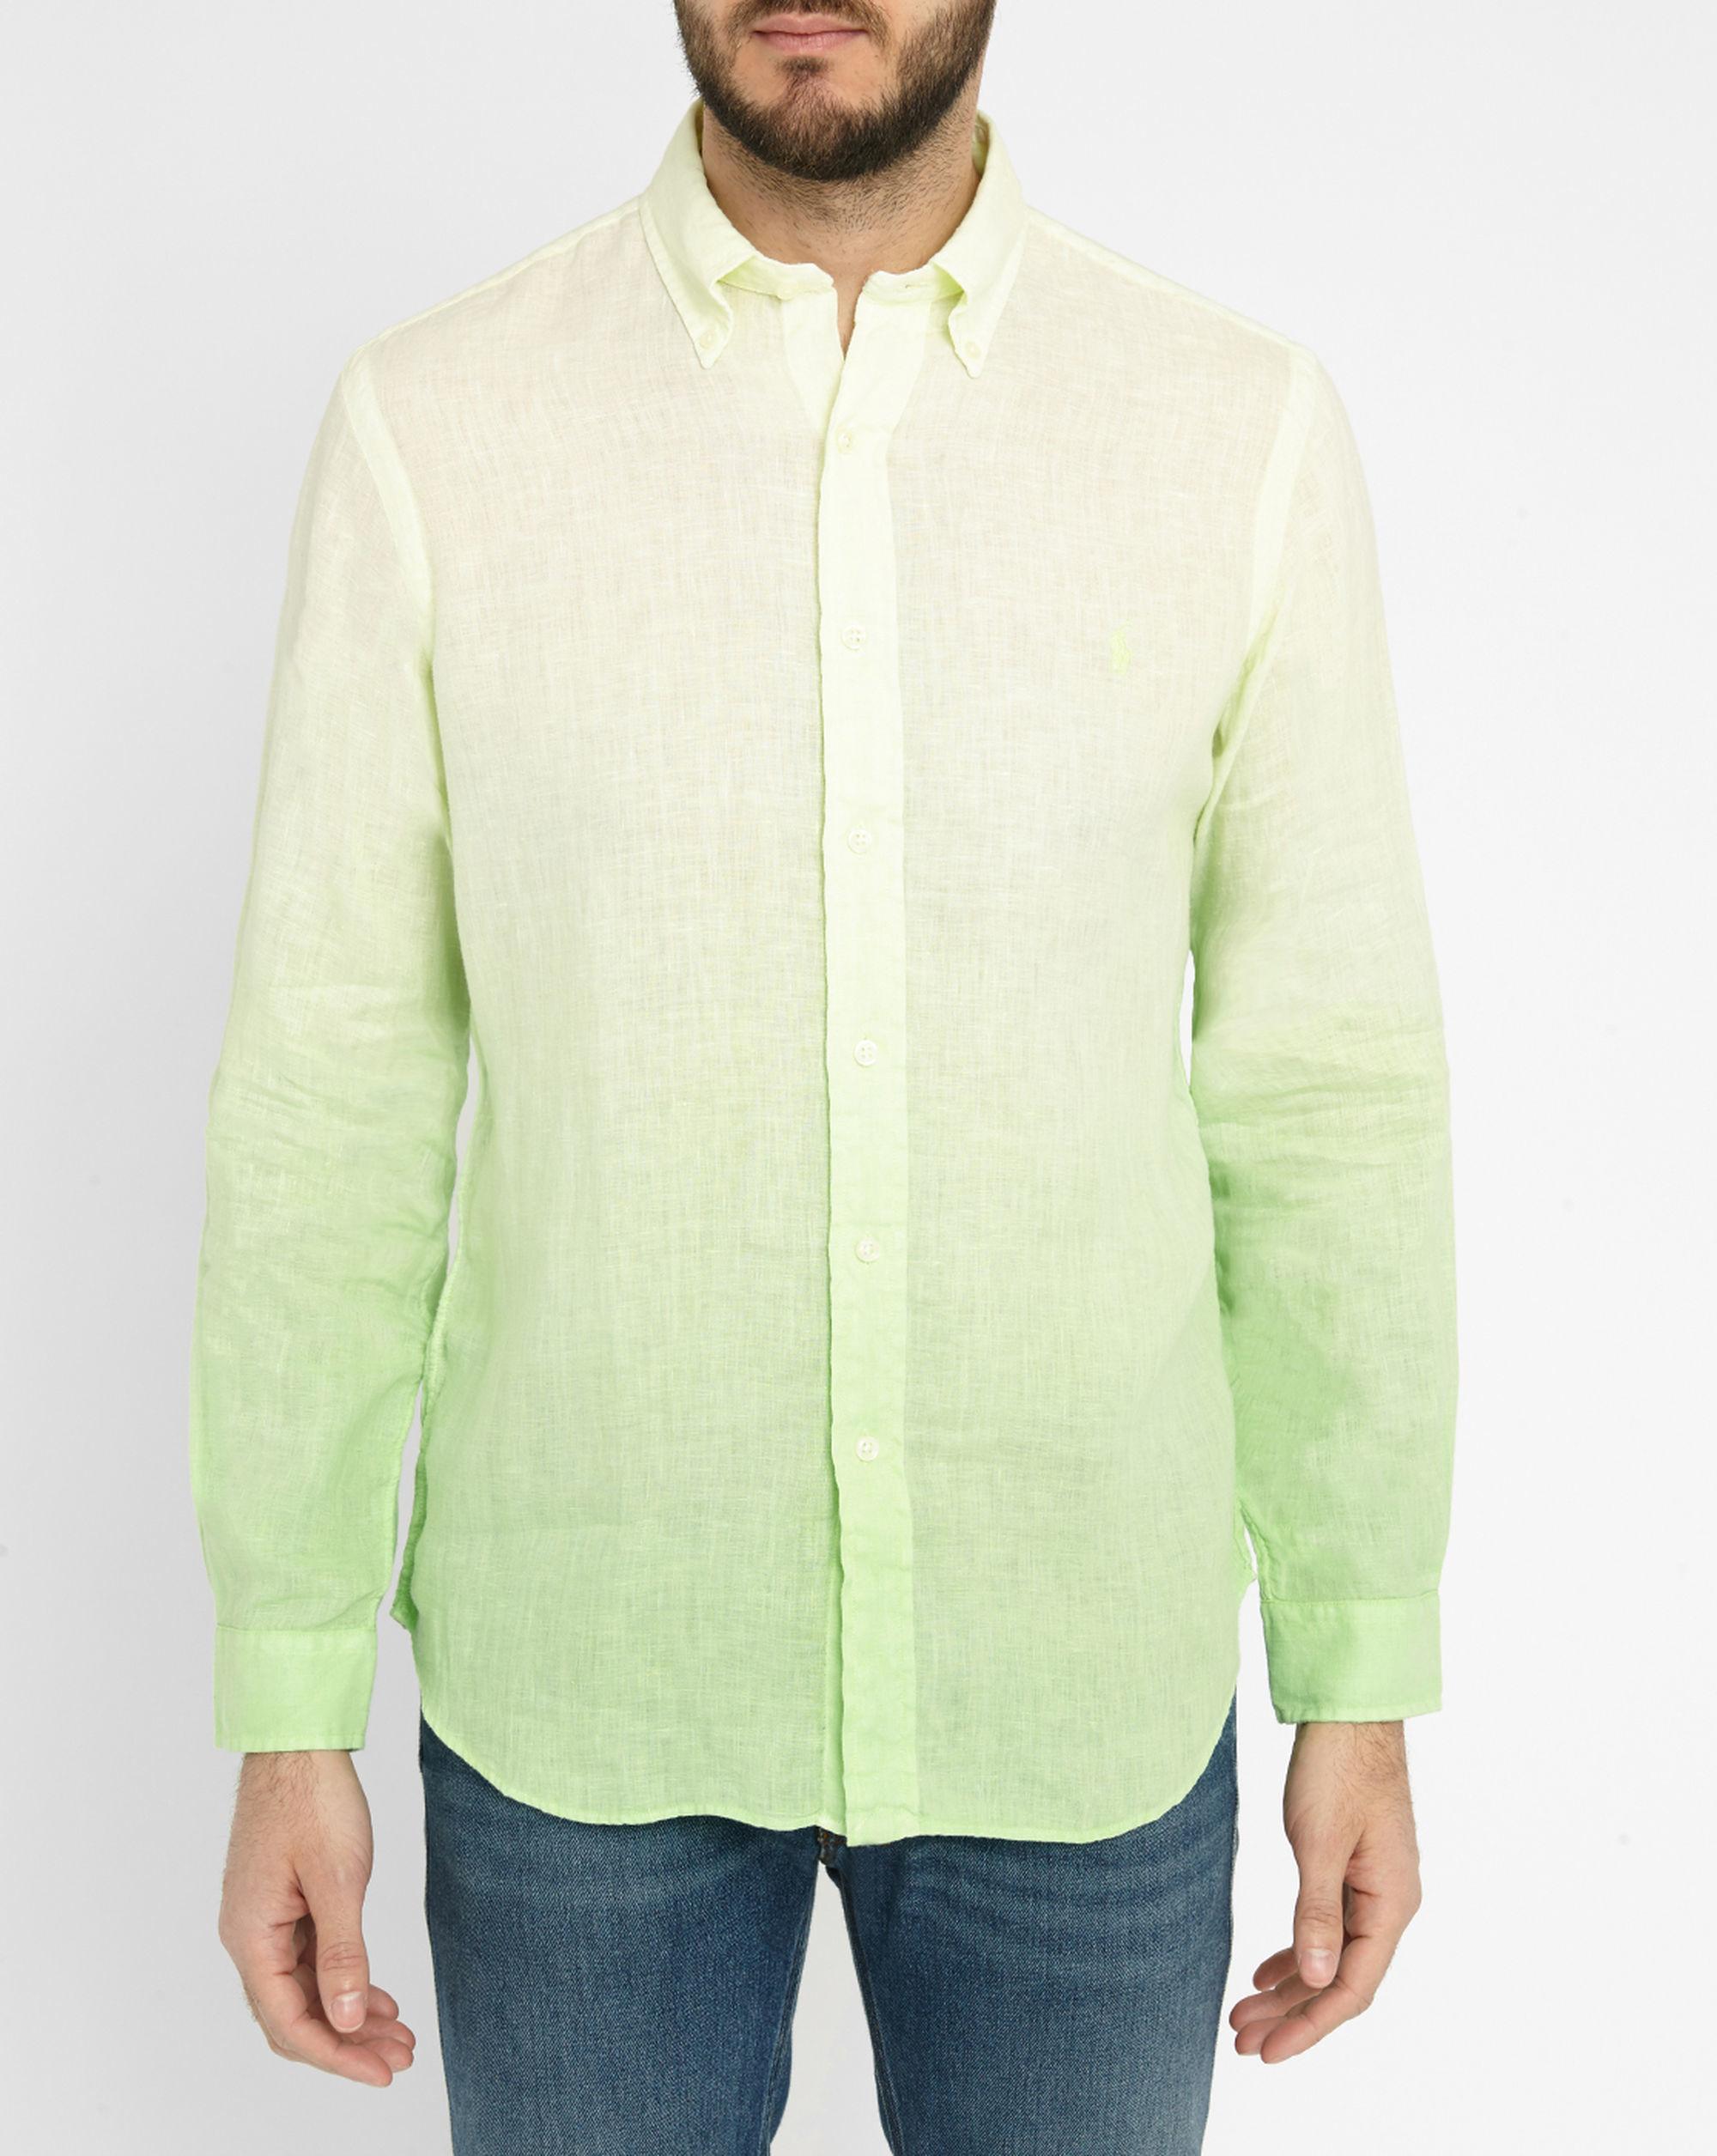 Polo Ralph Lauren Lime Tie Dye Linen Shirt In Green For